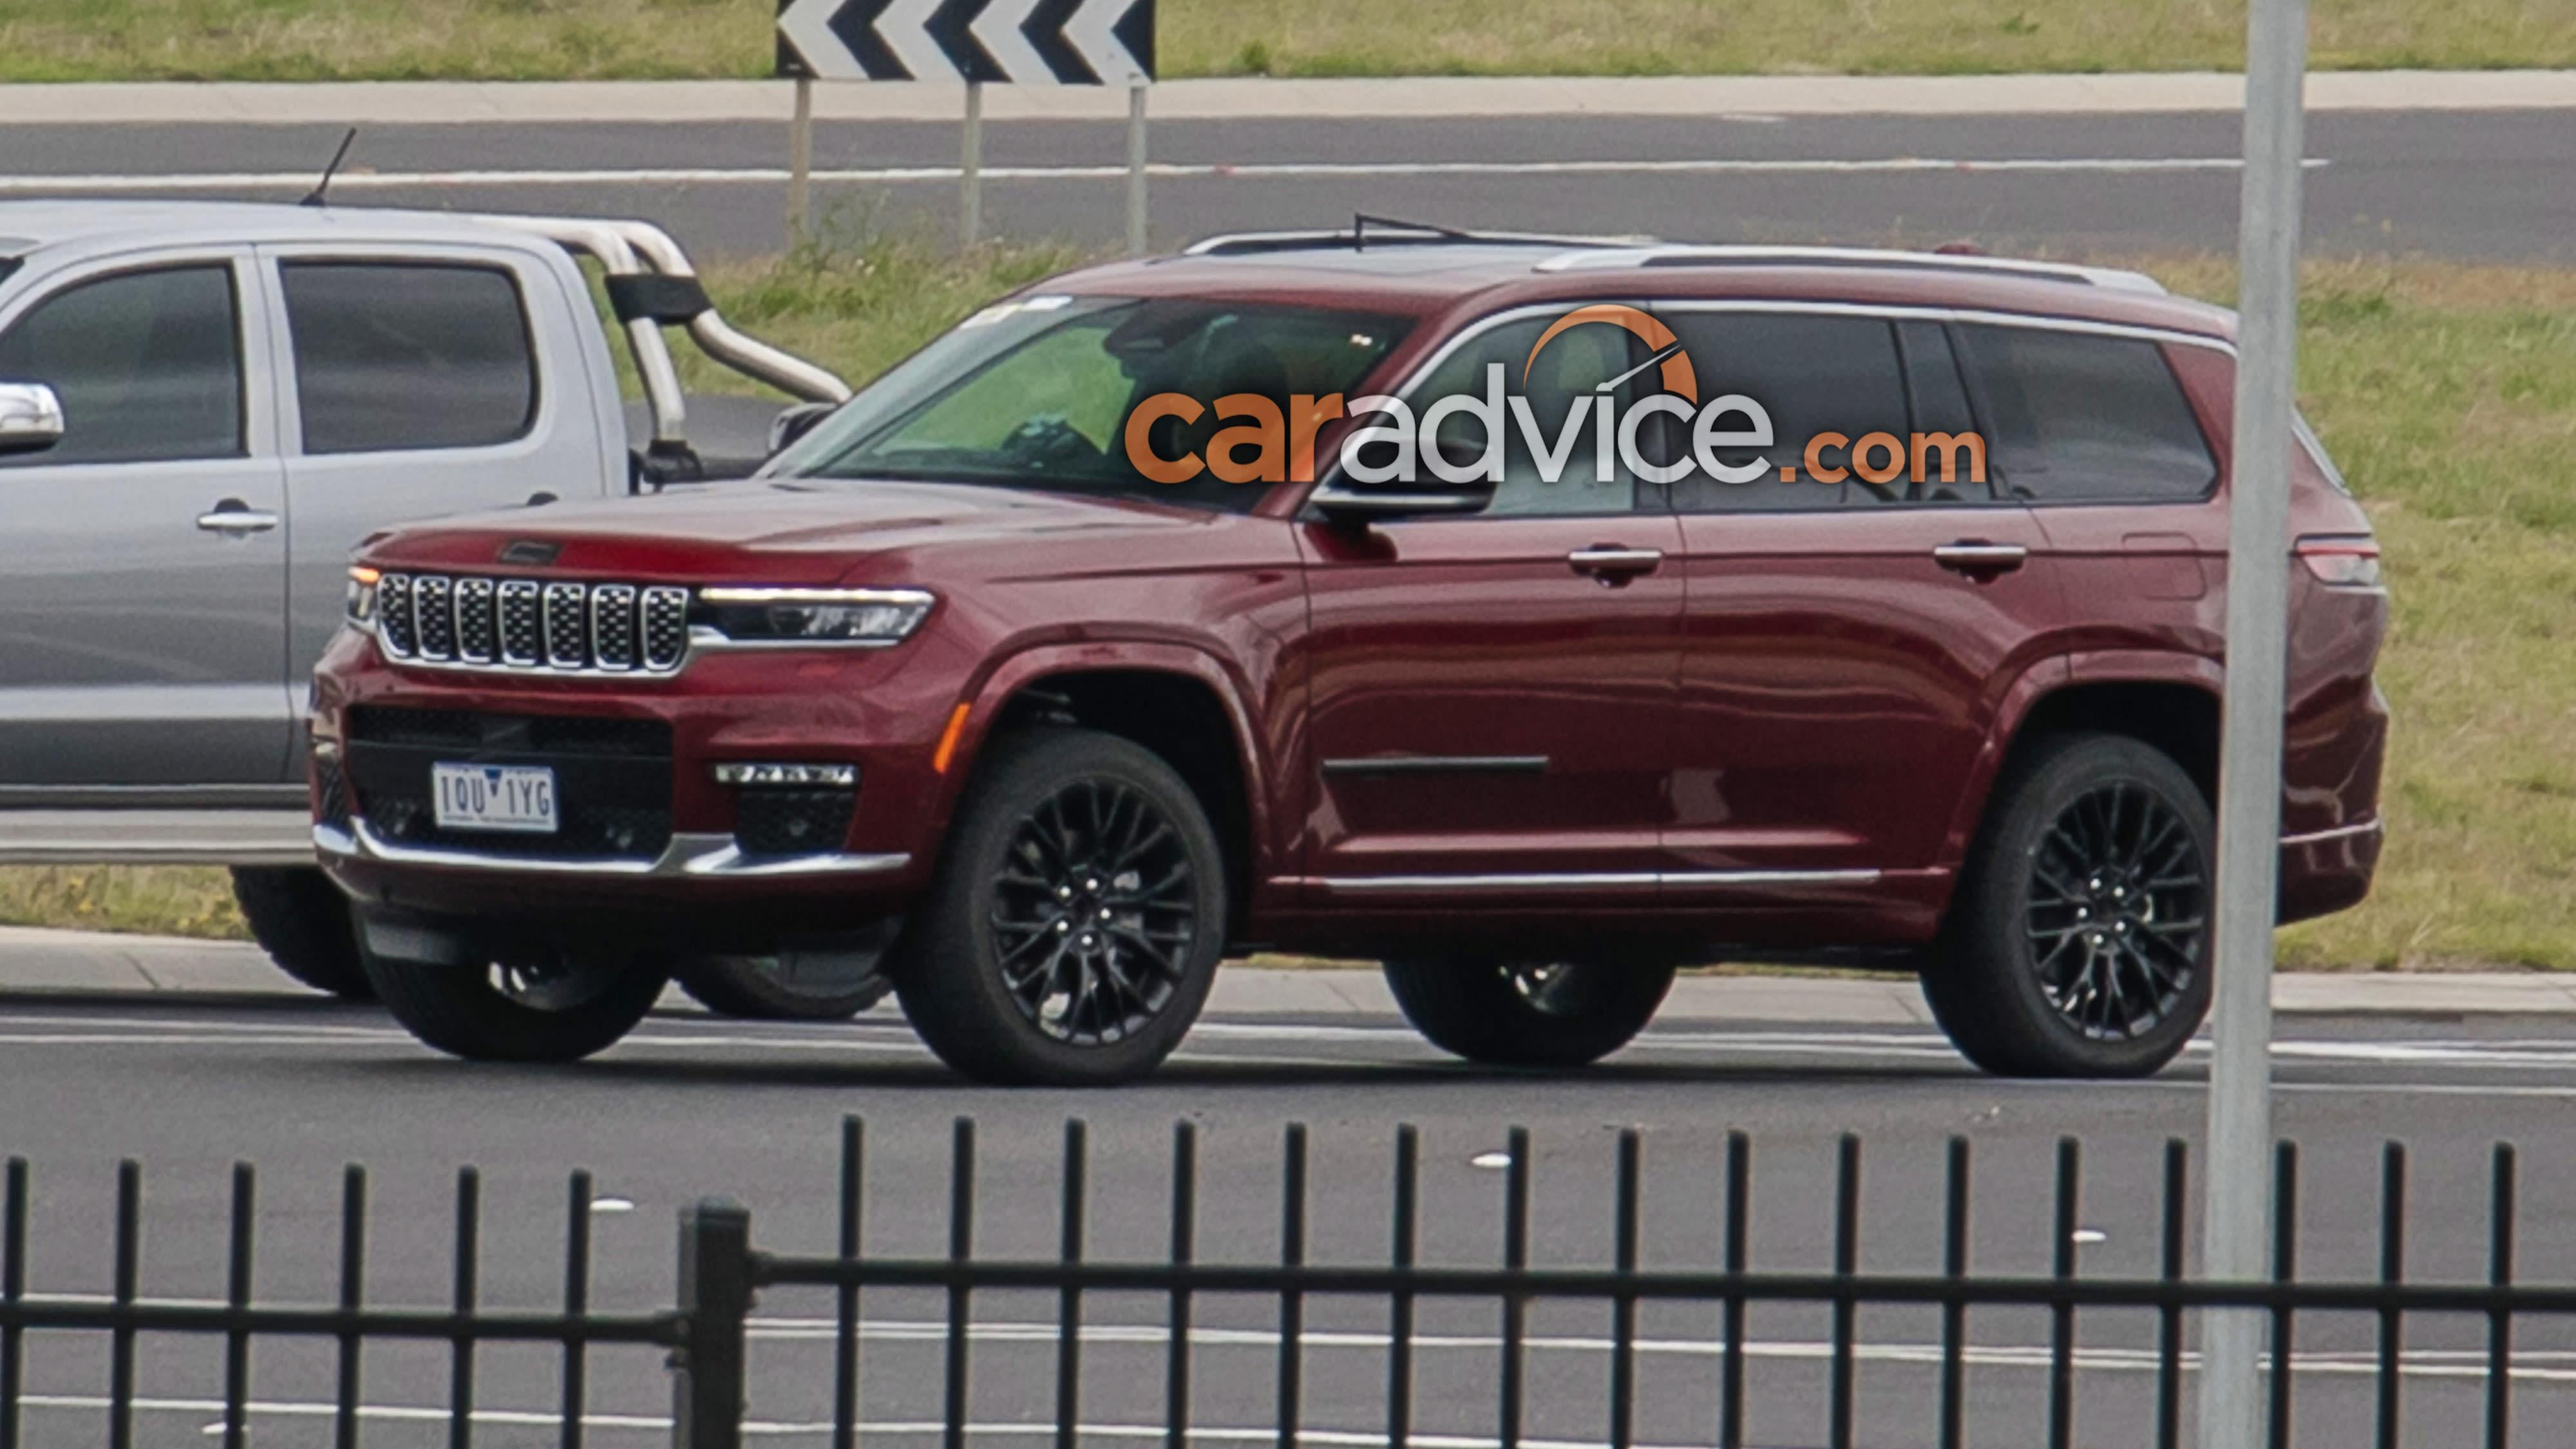 2021 Jeep Grand Cherokee L Begins Australian Testing Update Undisguised Spy Pics Caradvice